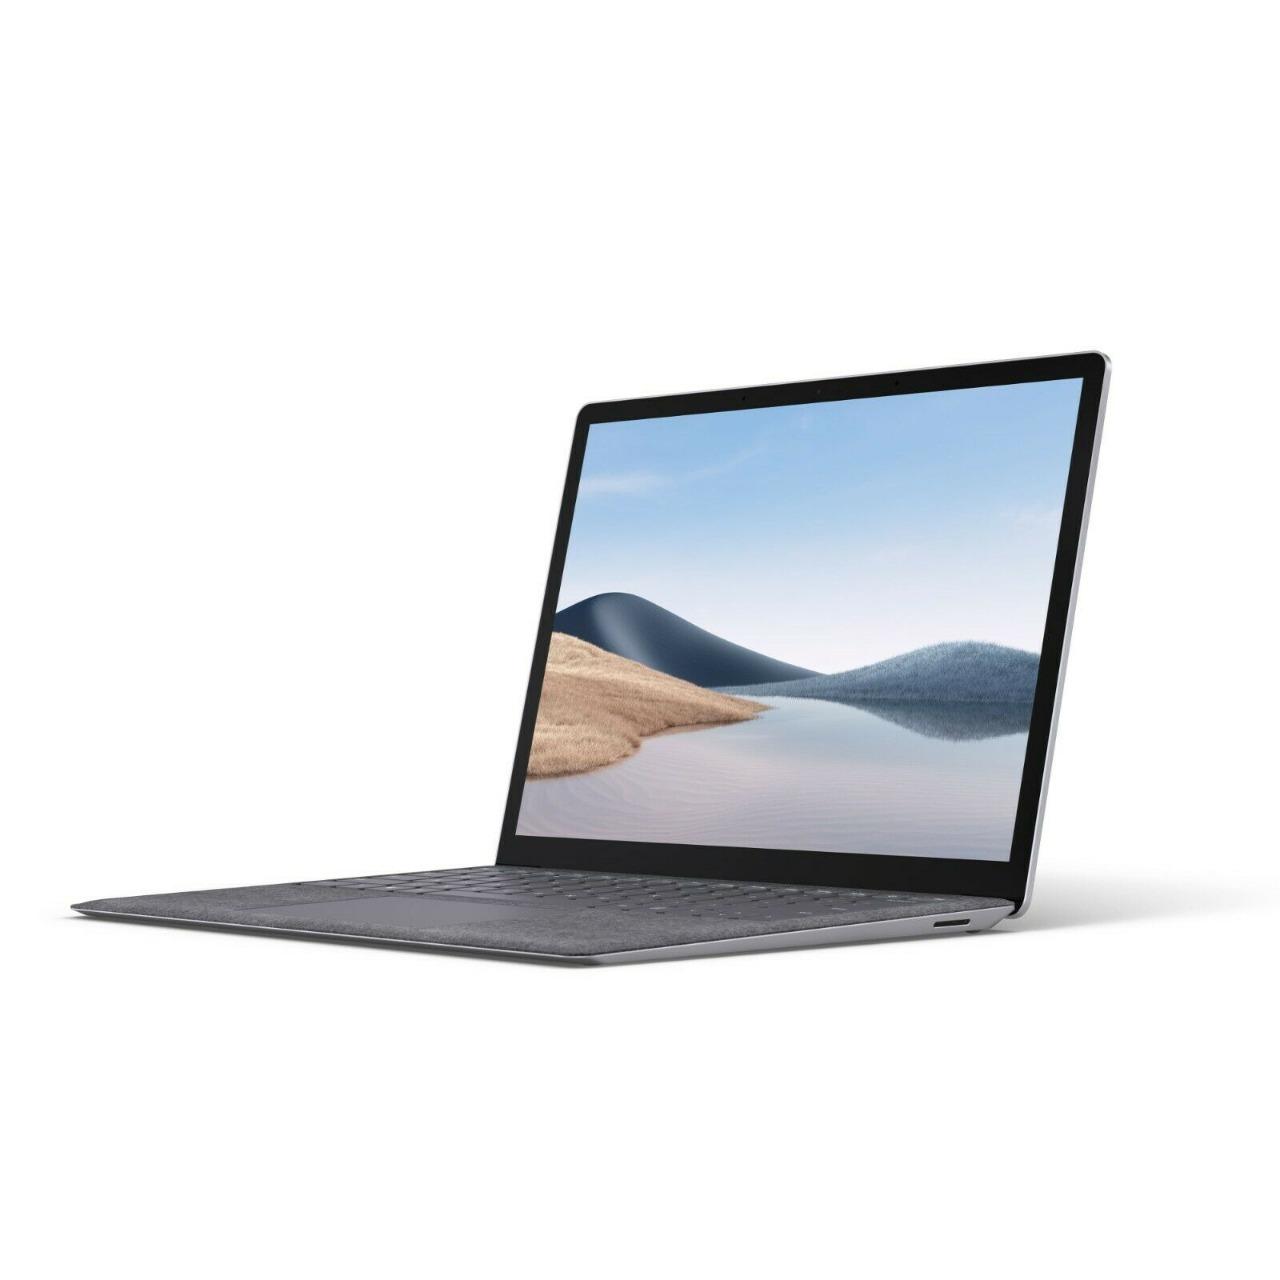 Microsoft Surface Laptop 4 13.5 AMD Ryzen 5 16GB RAM 256GB SSD Platinum